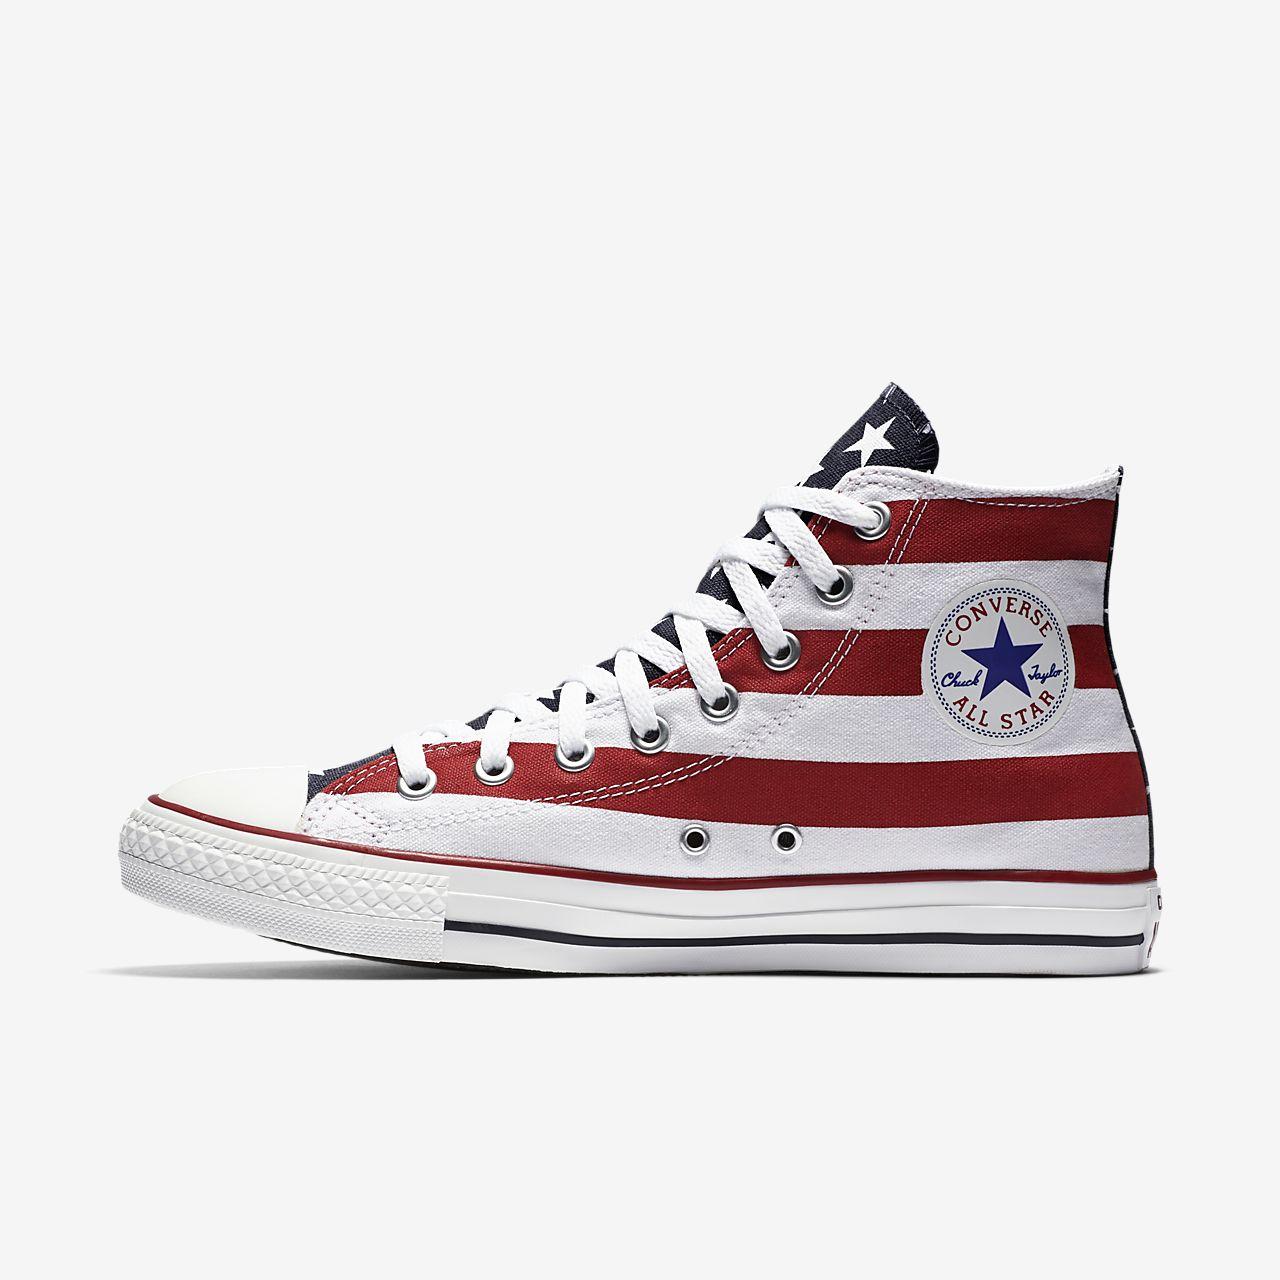 converse shoes chuck